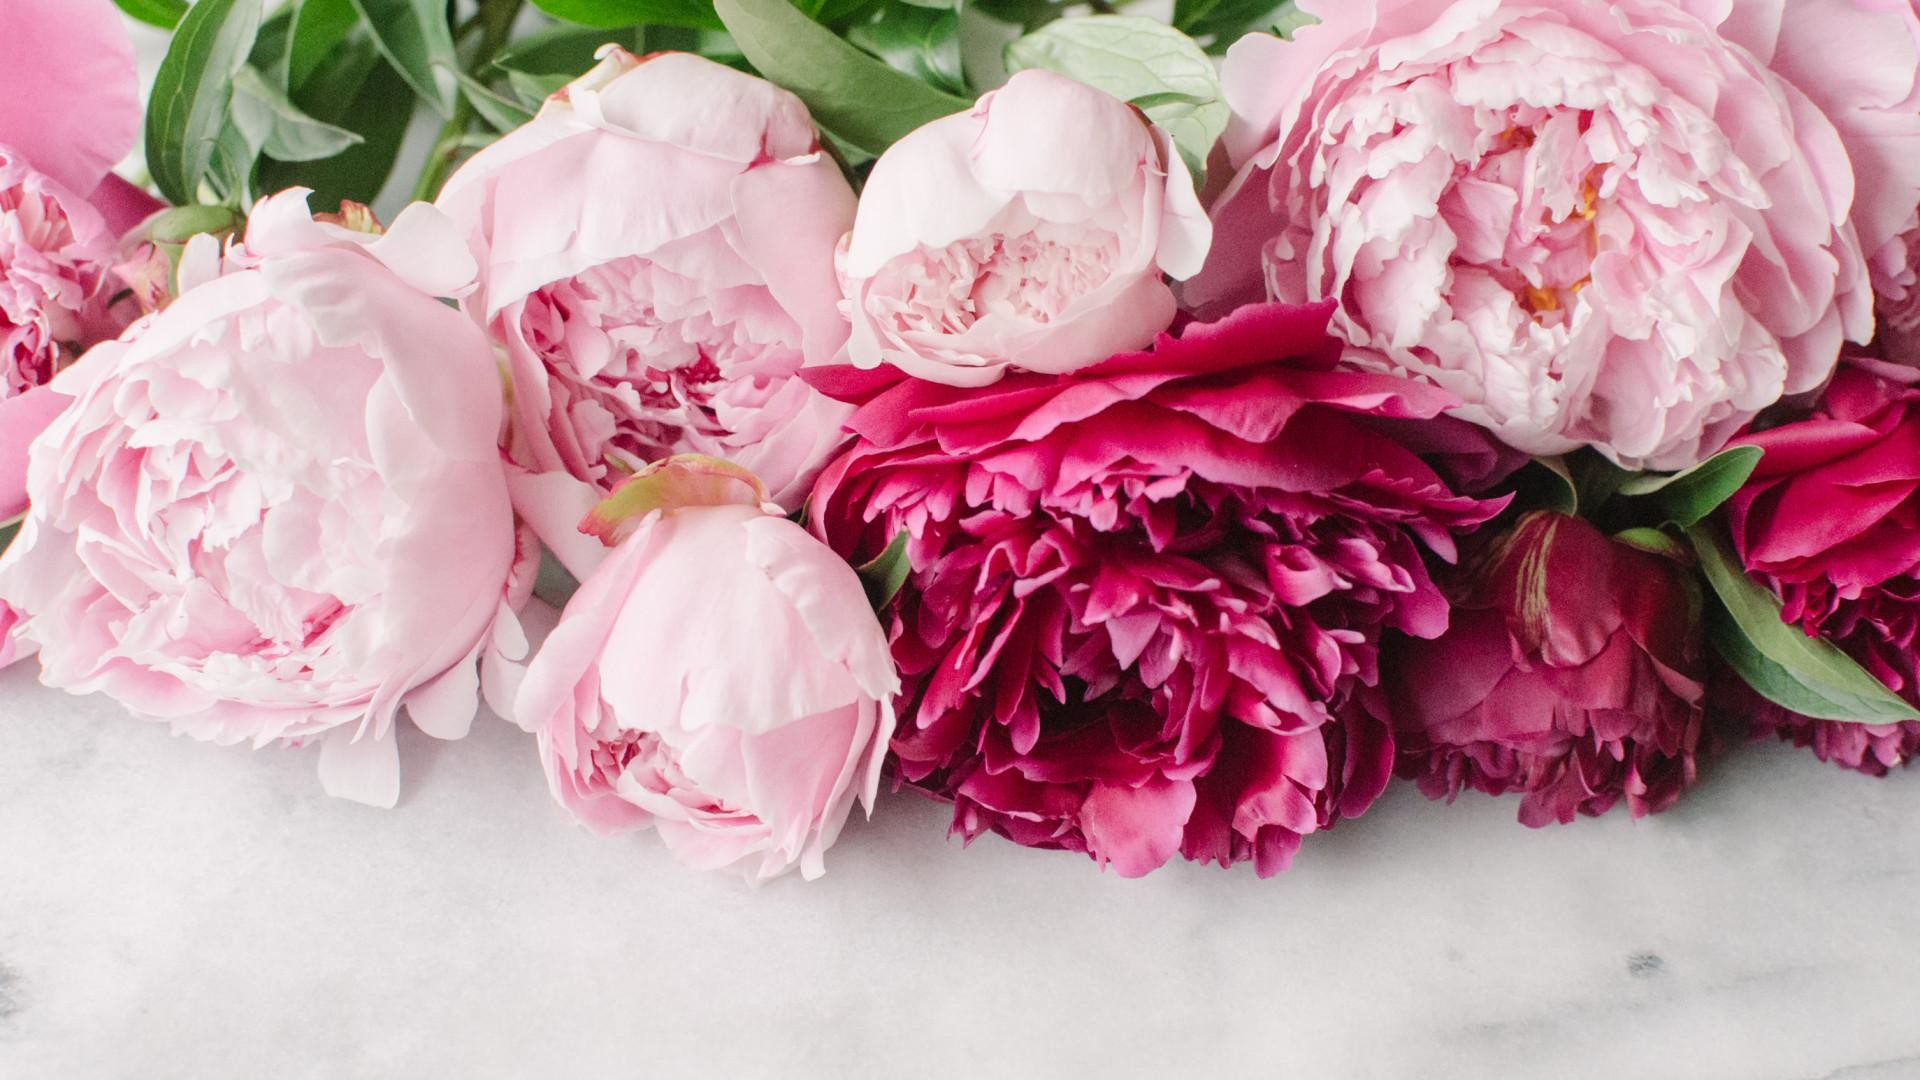 pink peonies wallpaper 46 images